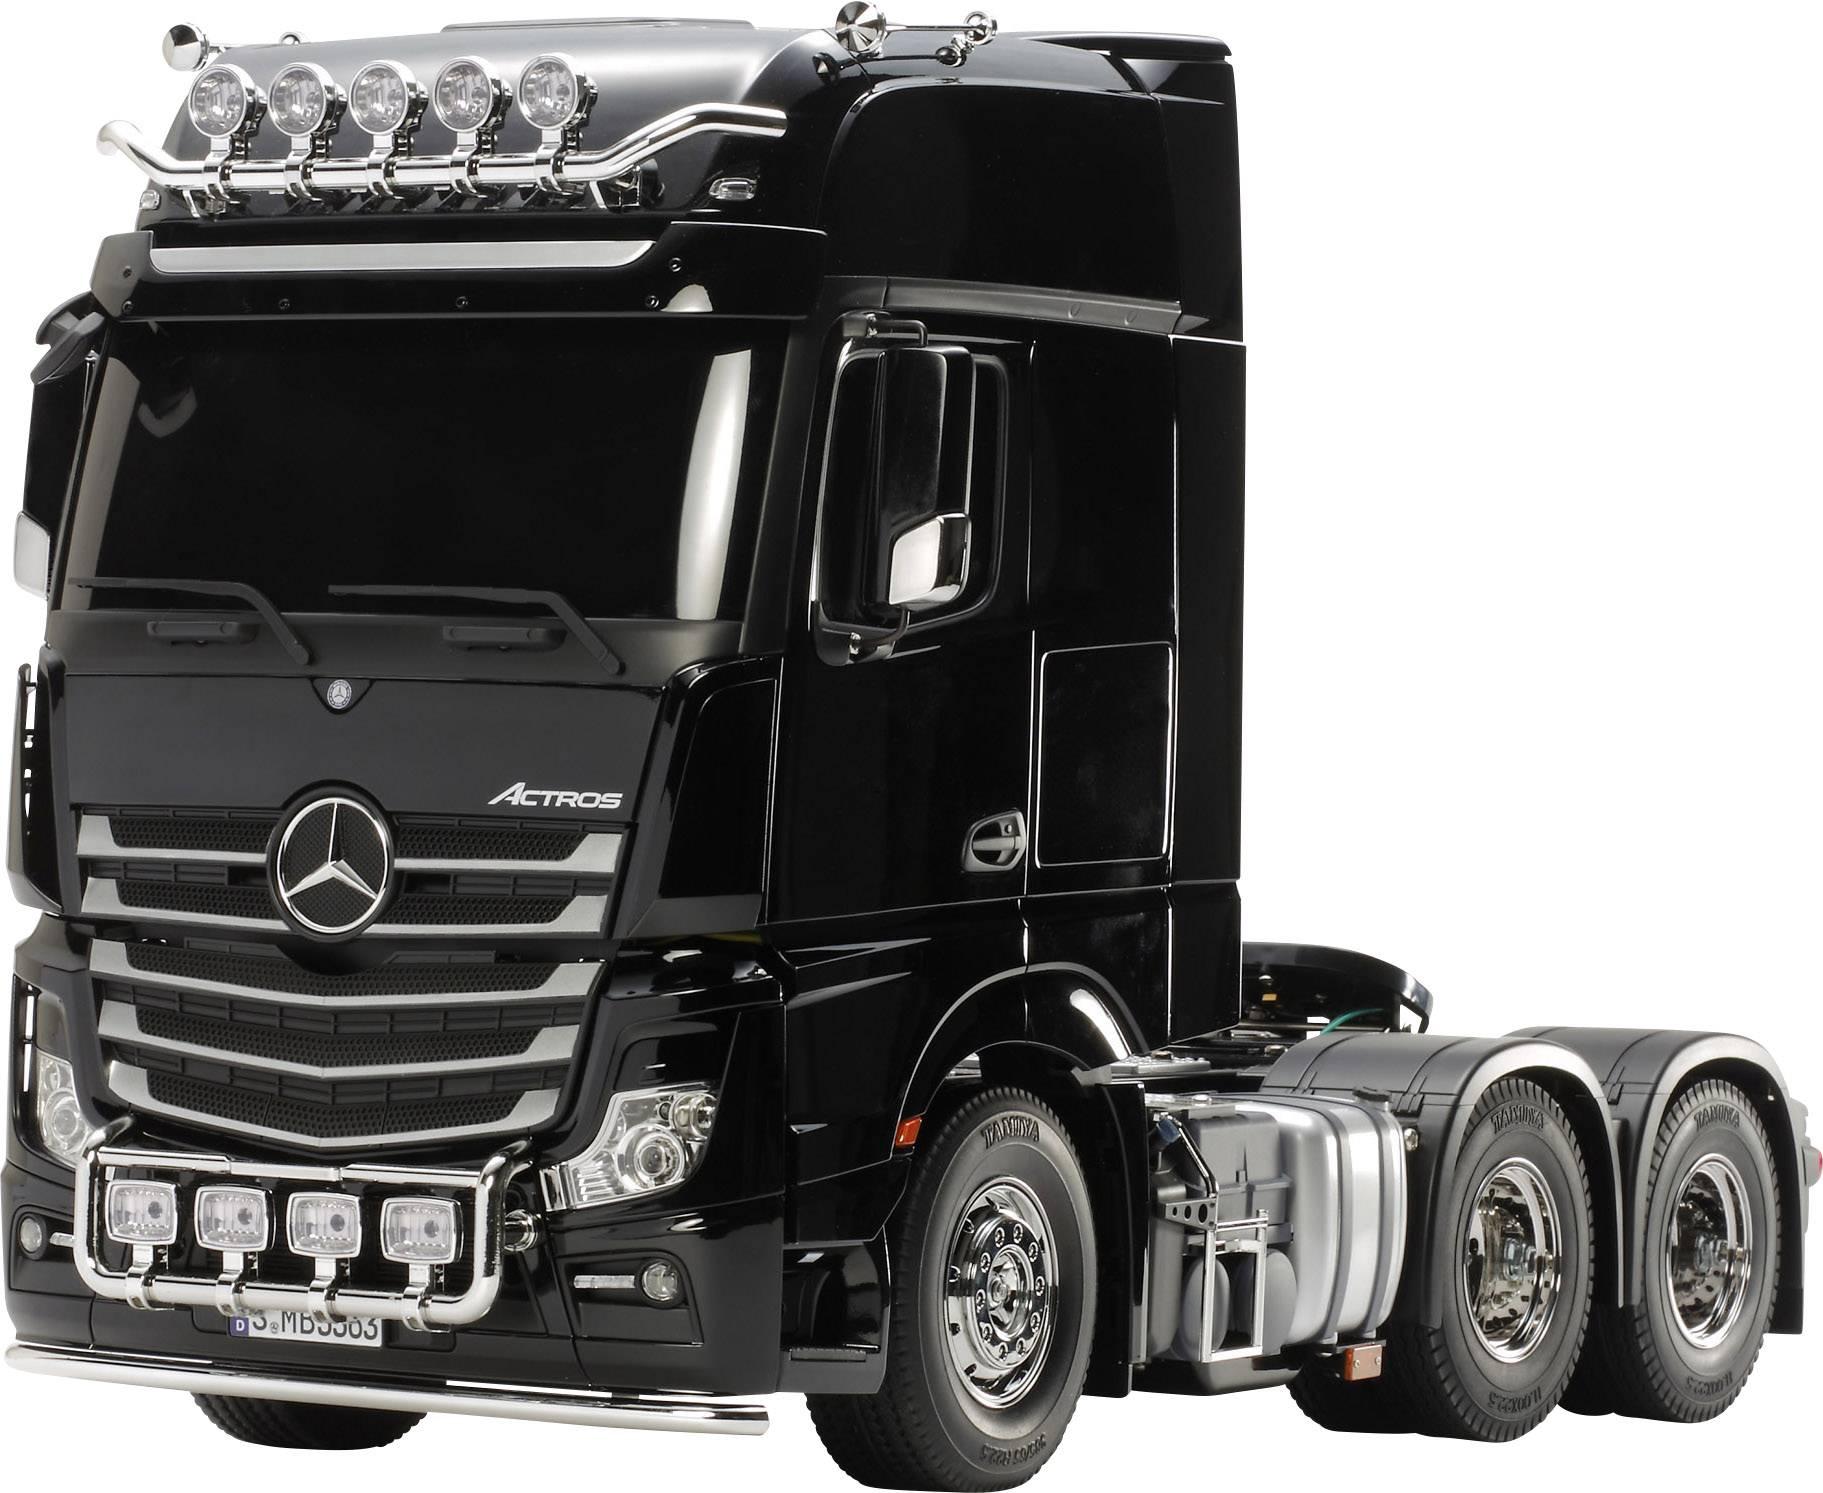 Mercedes Benz Actros 3363 6x4 Gigaspace Tamiya 300056348, 1:14 ,BS